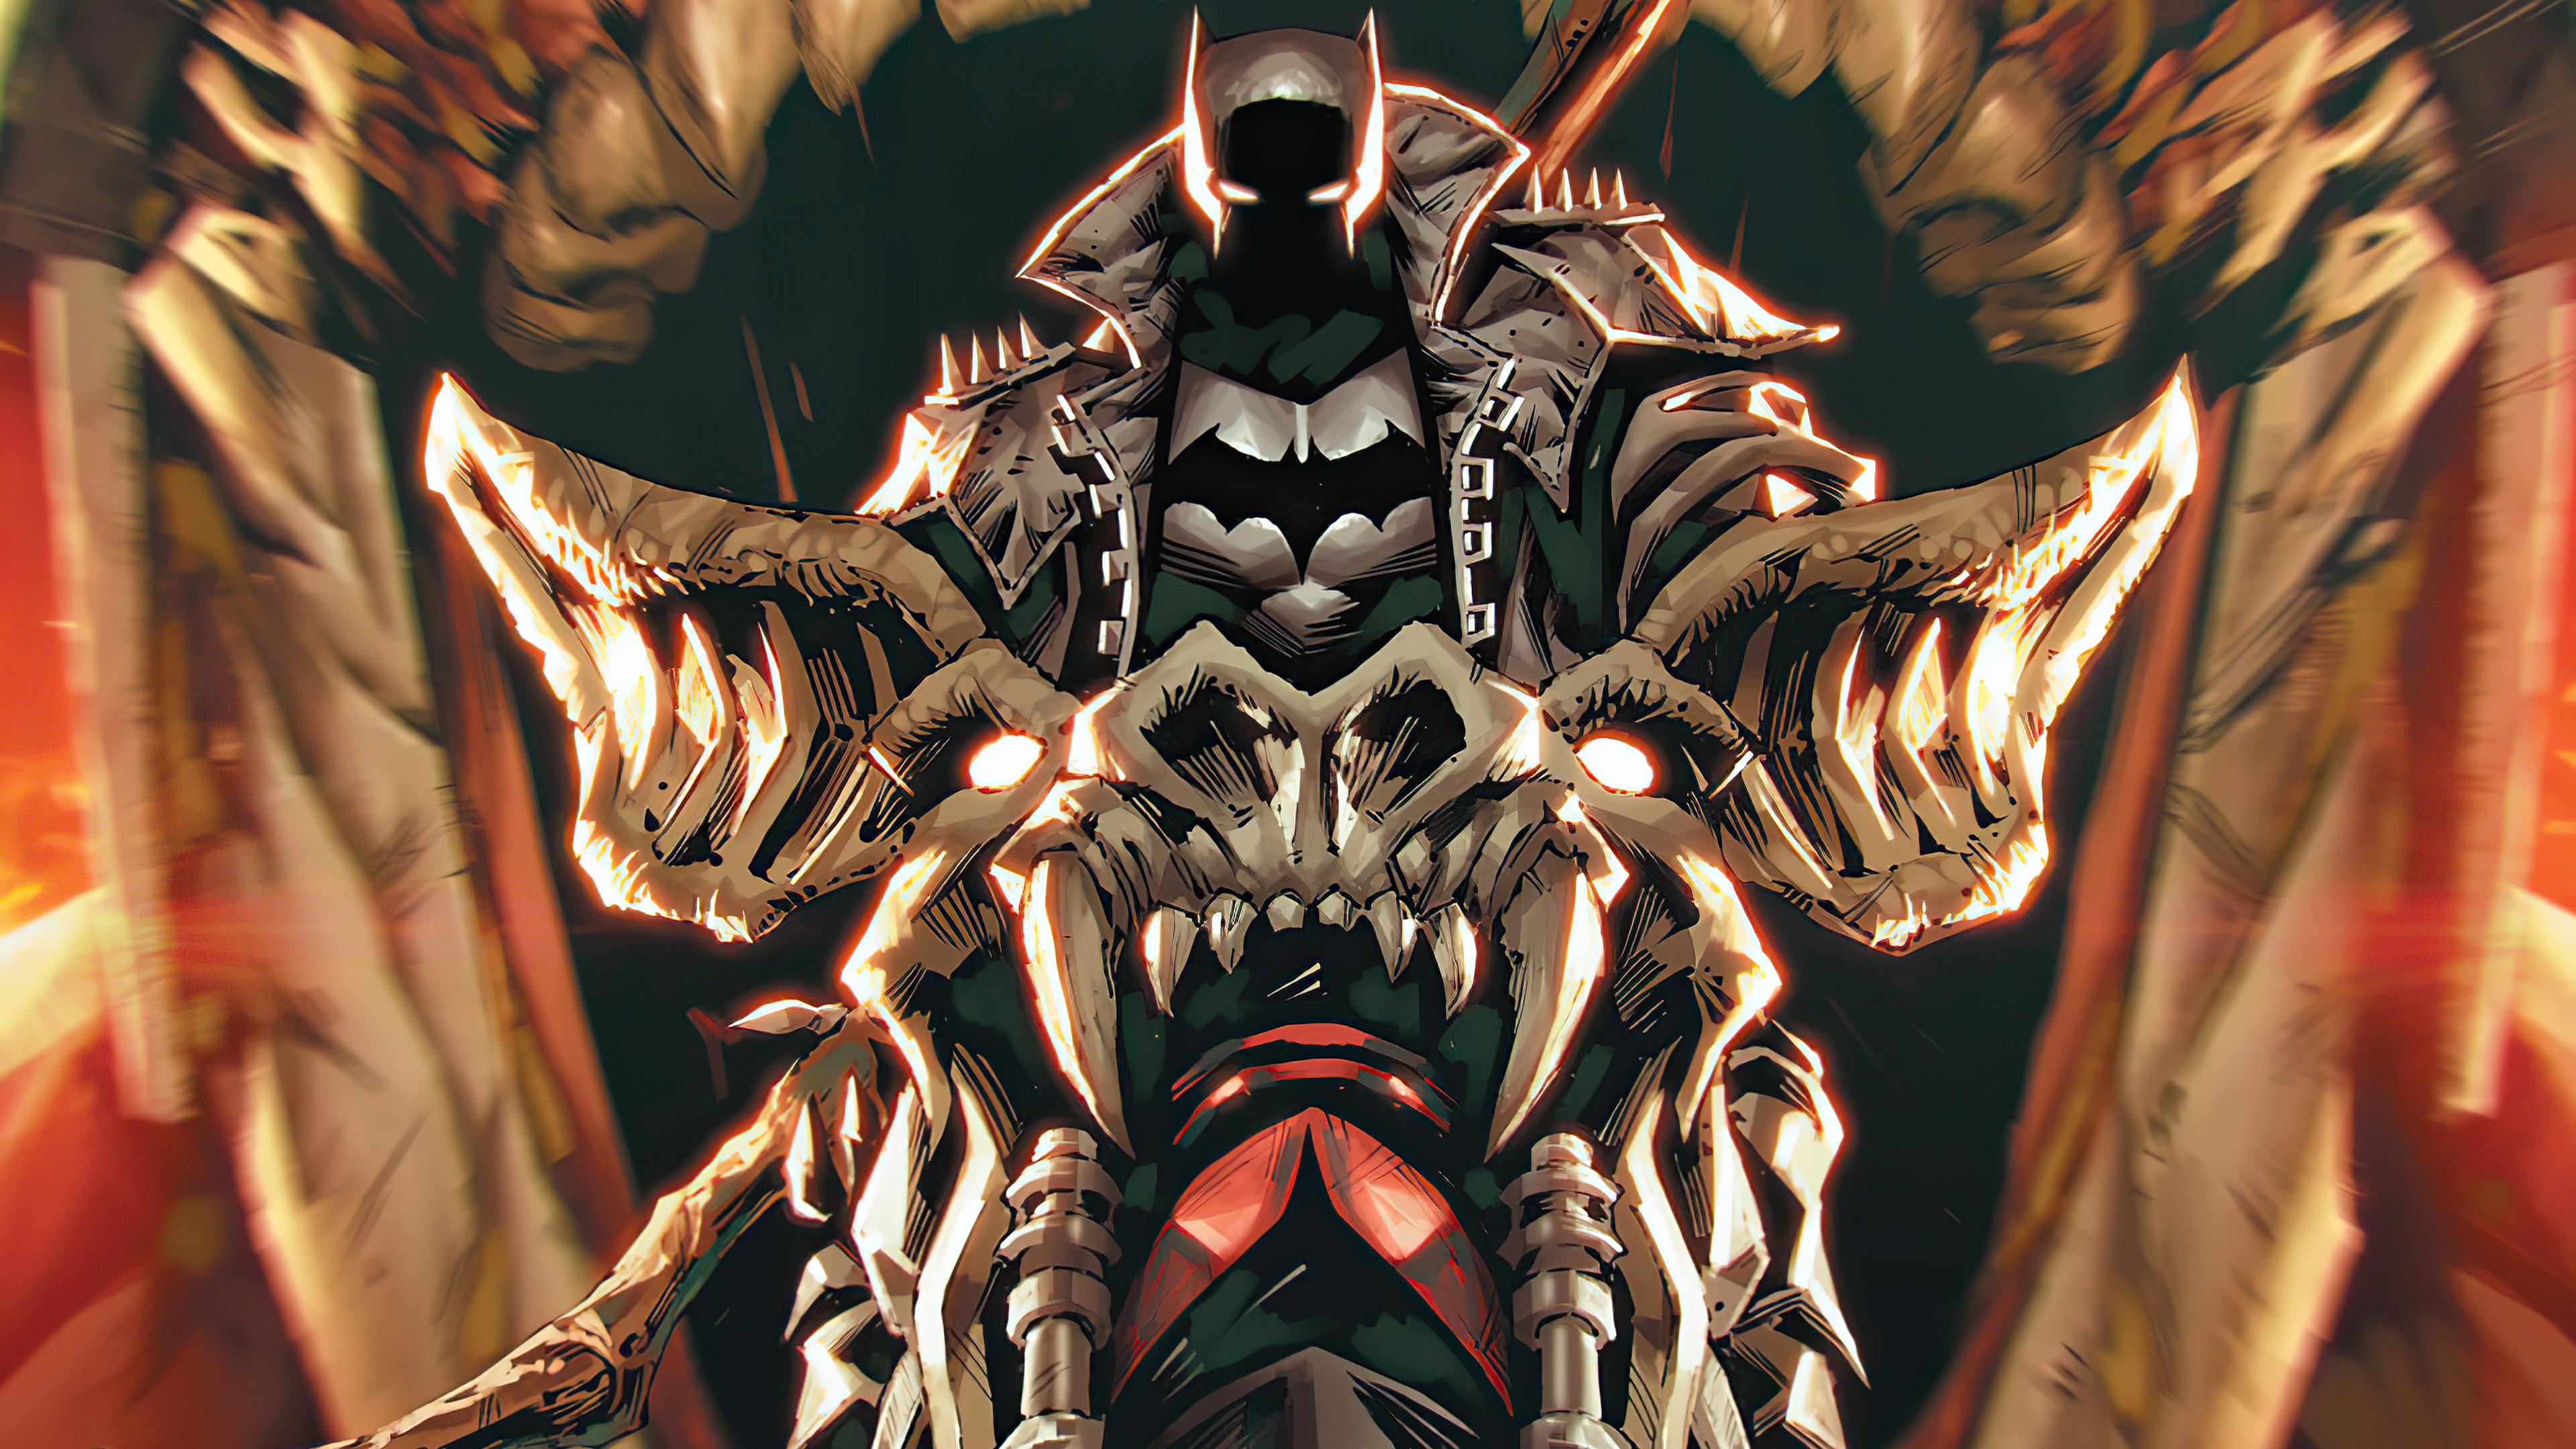 Batman dark knight returns color by dushans | Dark knight